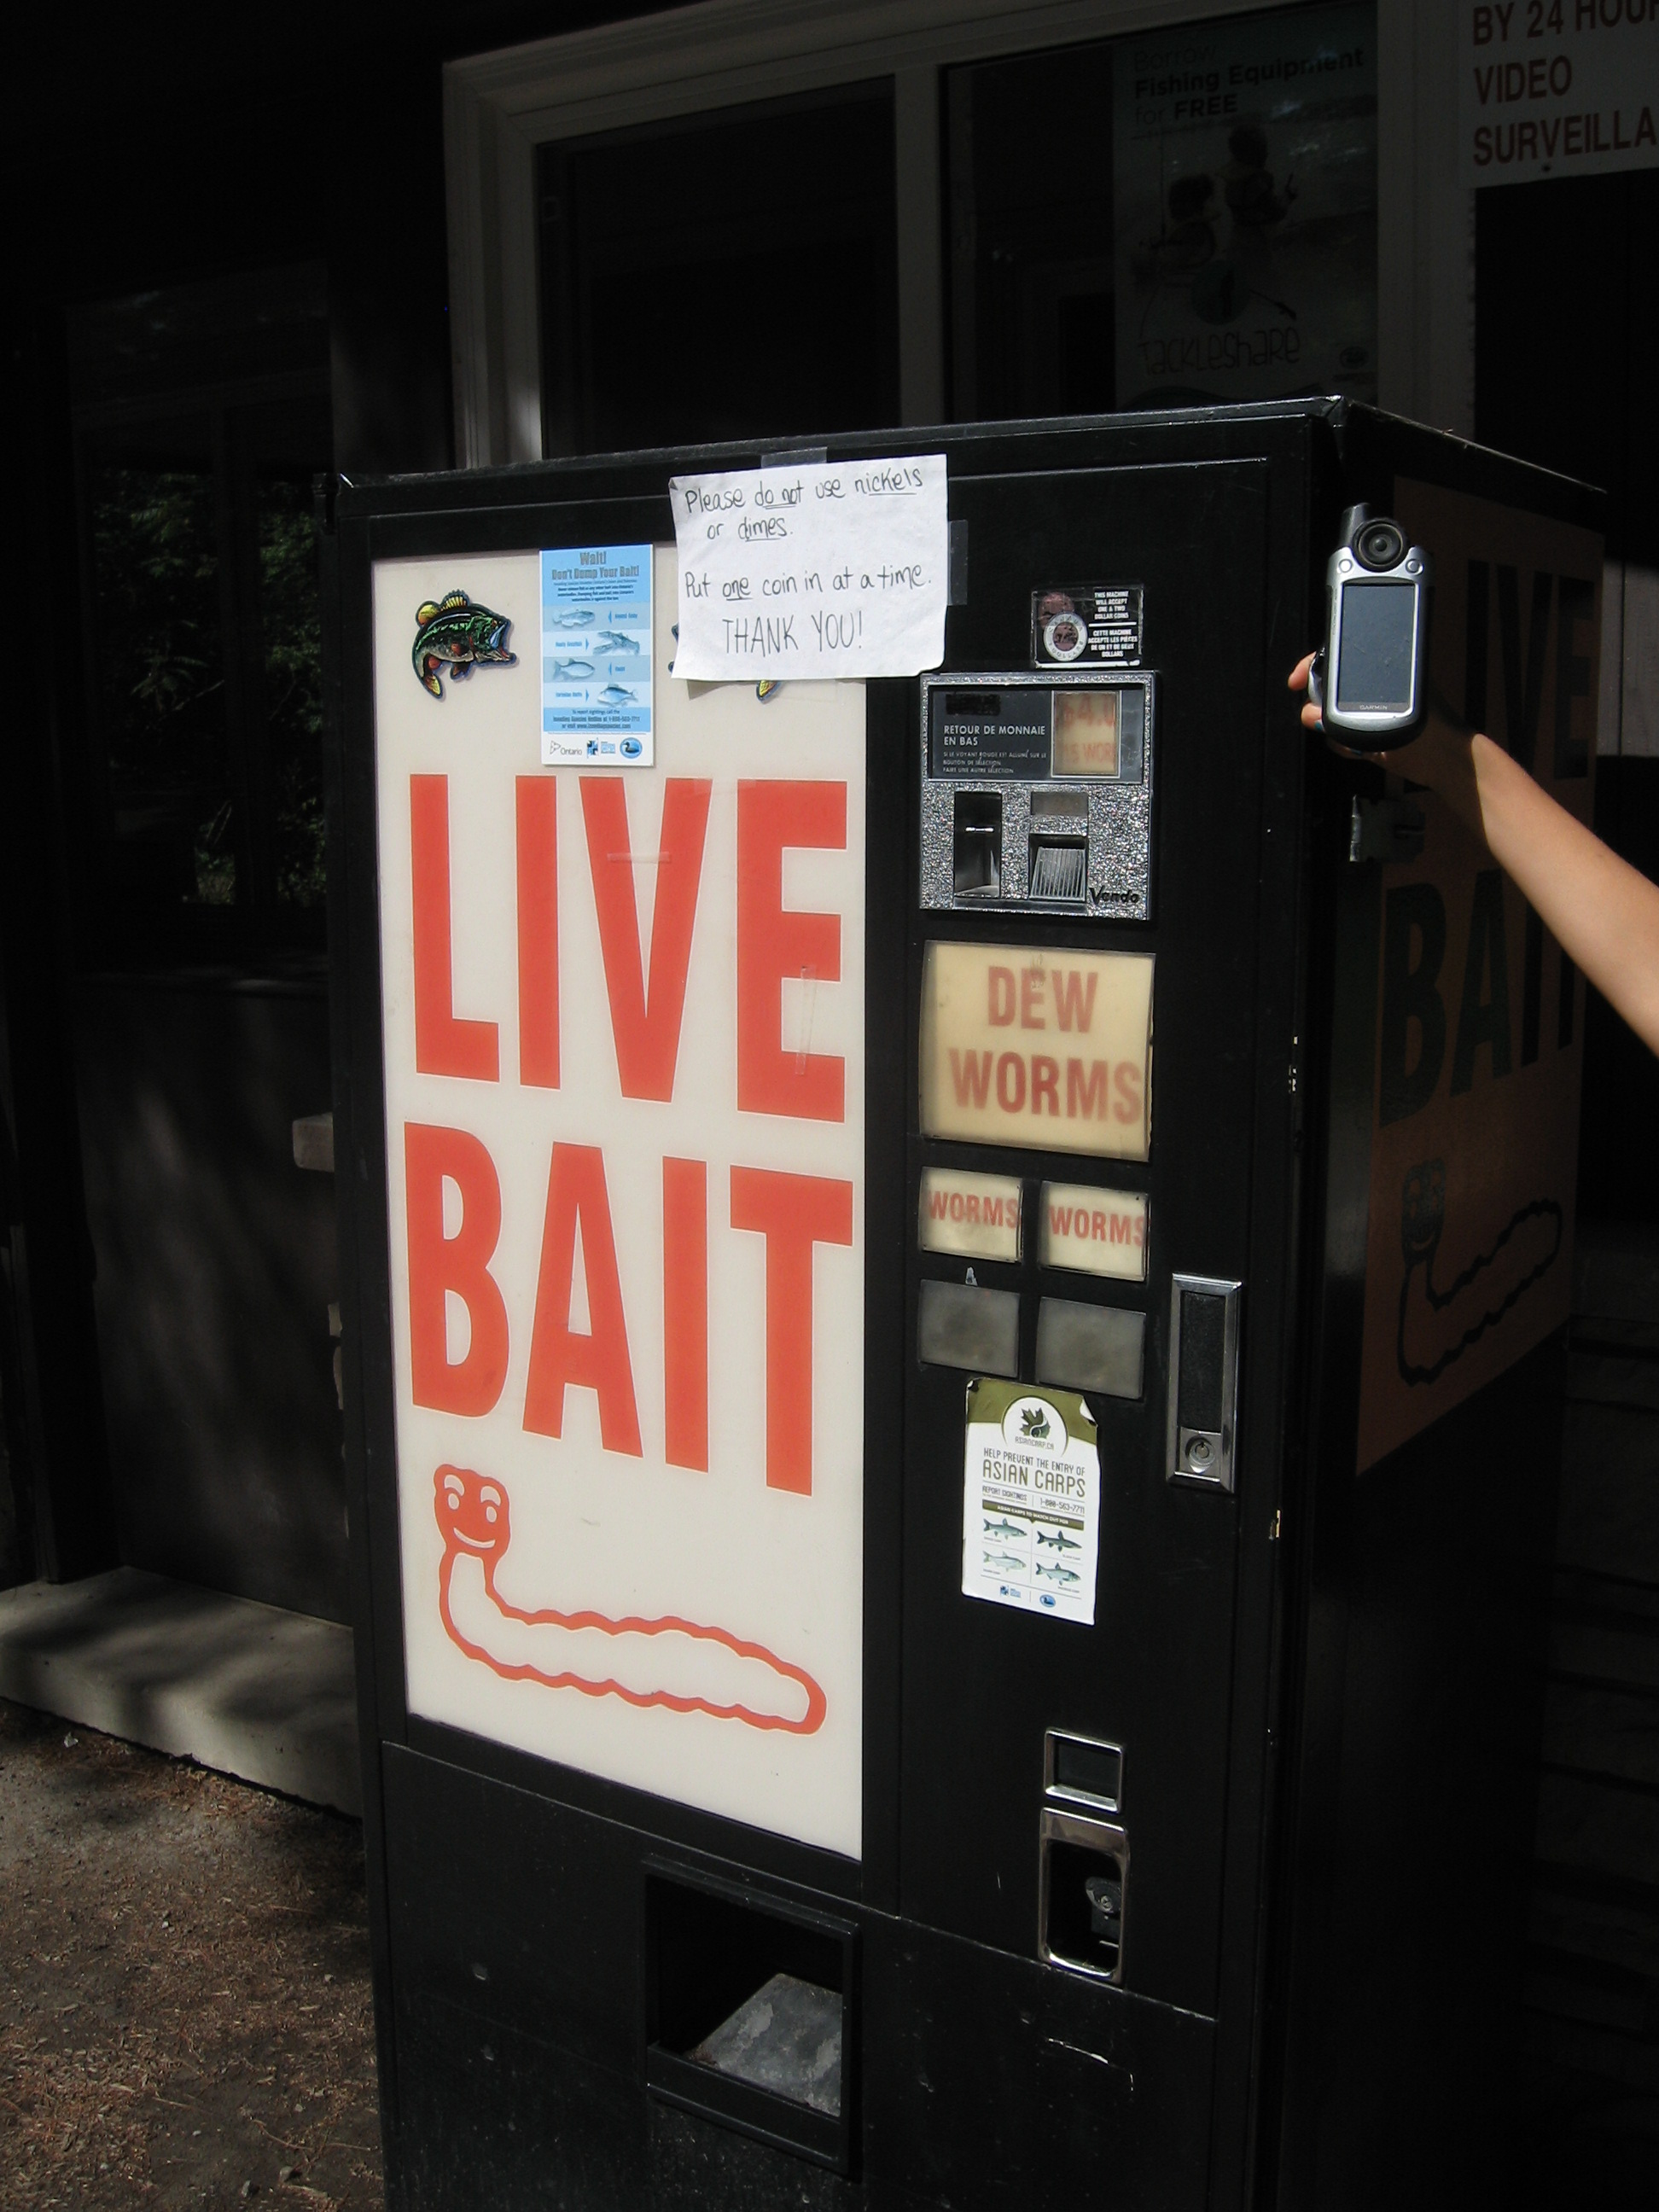 Rockwood CA Dew Worm Vending Machine - Rockwood, ON - Bait